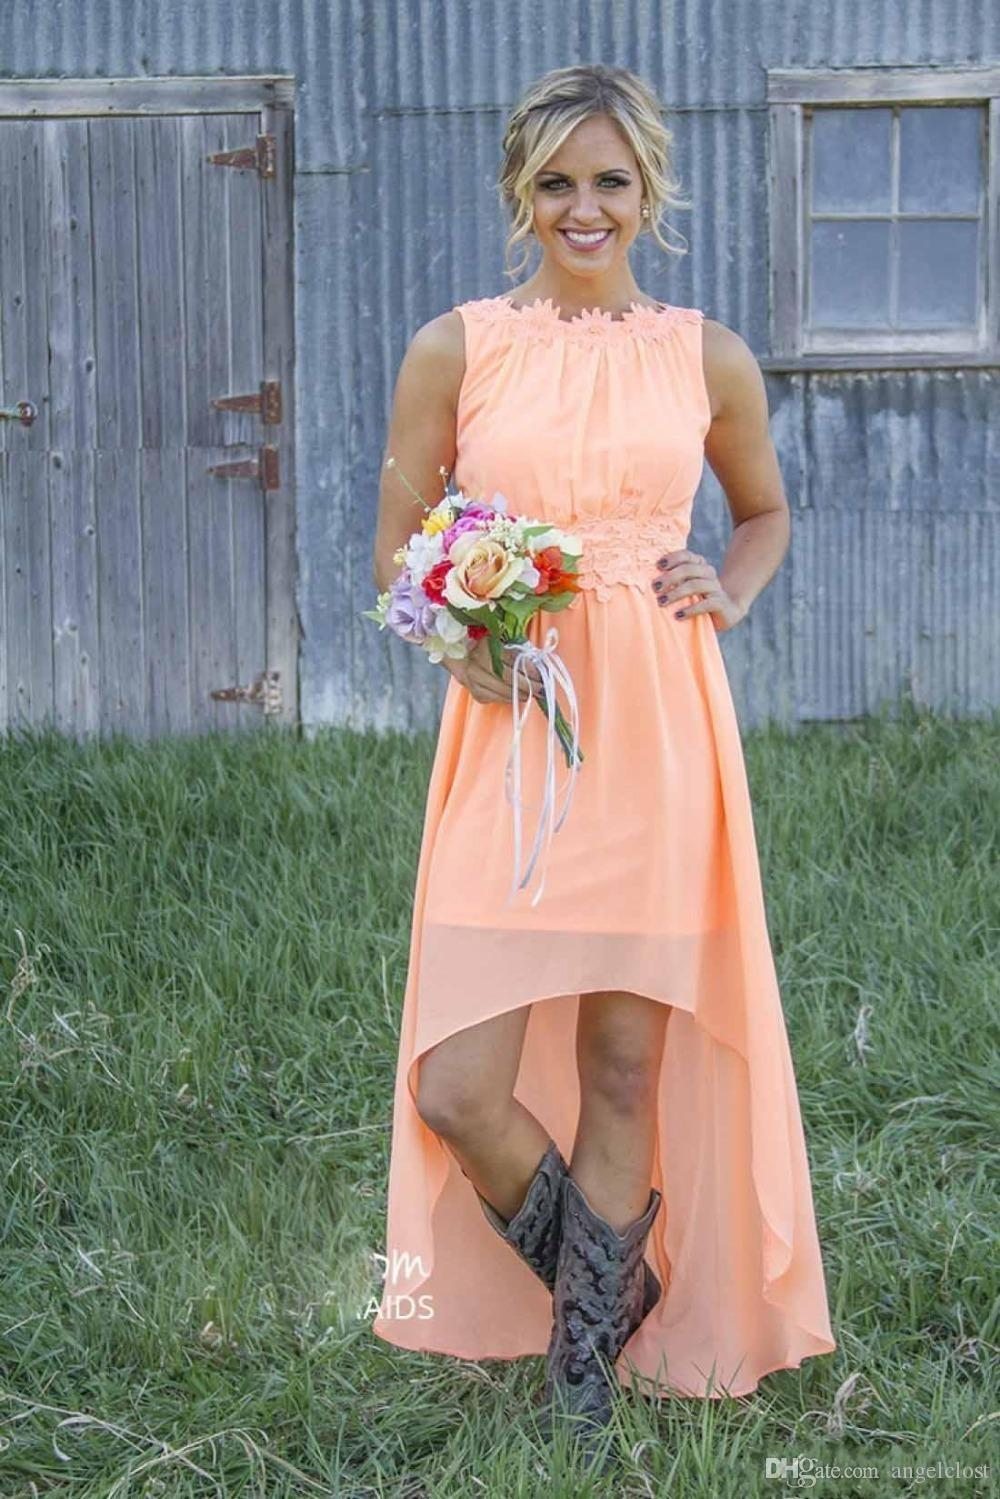 2019 New Country Hi-Lo 들러리 드레스 특종 등이없는 High Low Pleats 쉬폰 Beach 메이드 오브 Honor Dress 웨딩 게스트 자 가운 싼